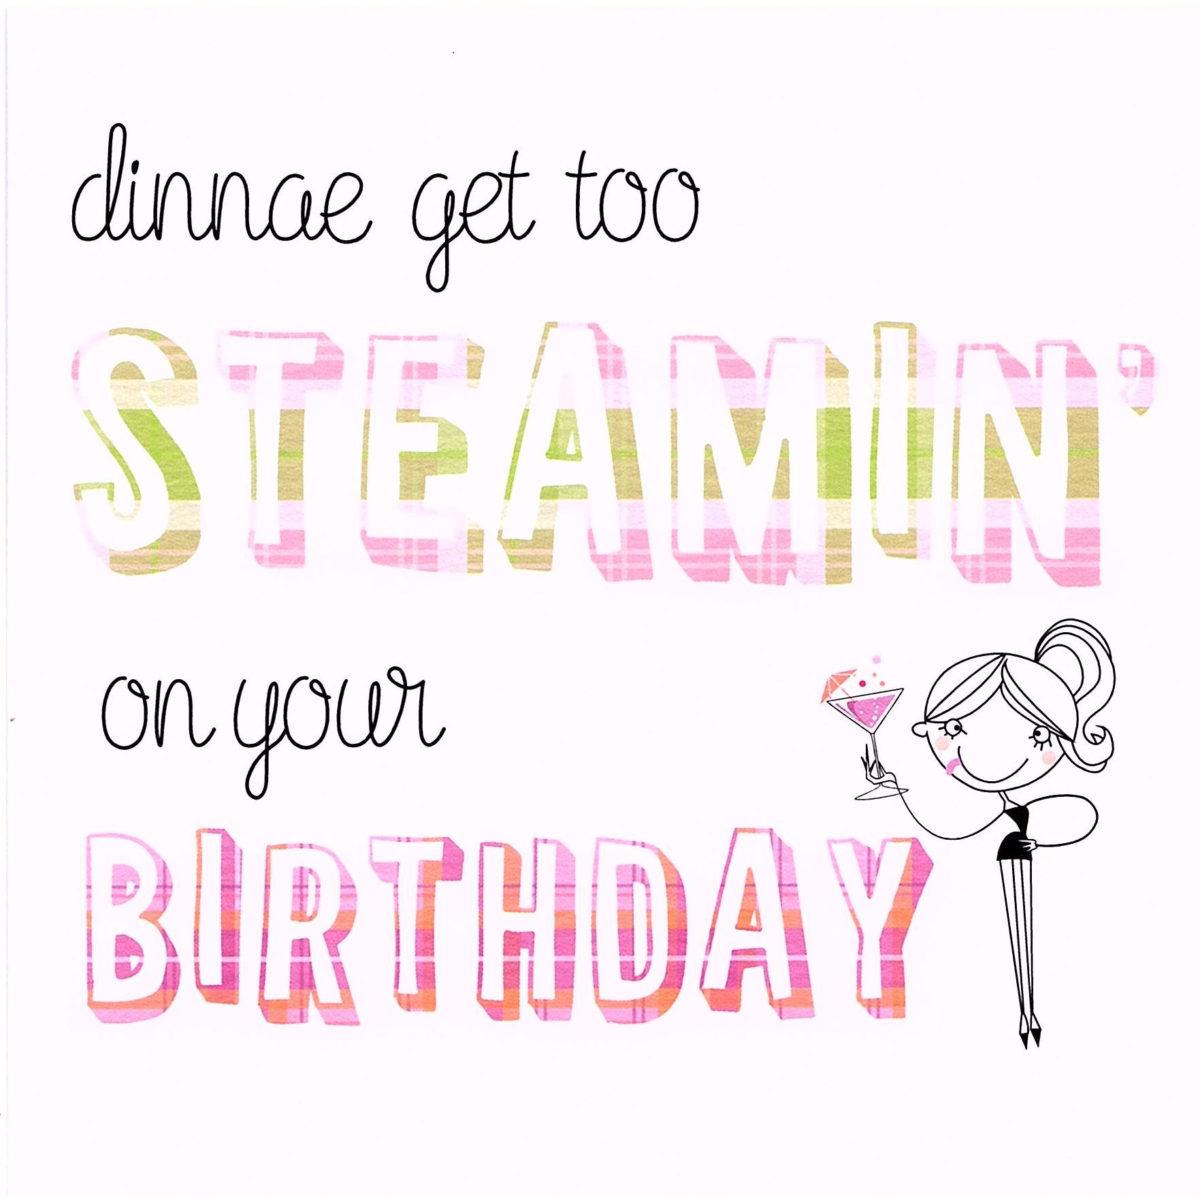 Steamin' Birthday